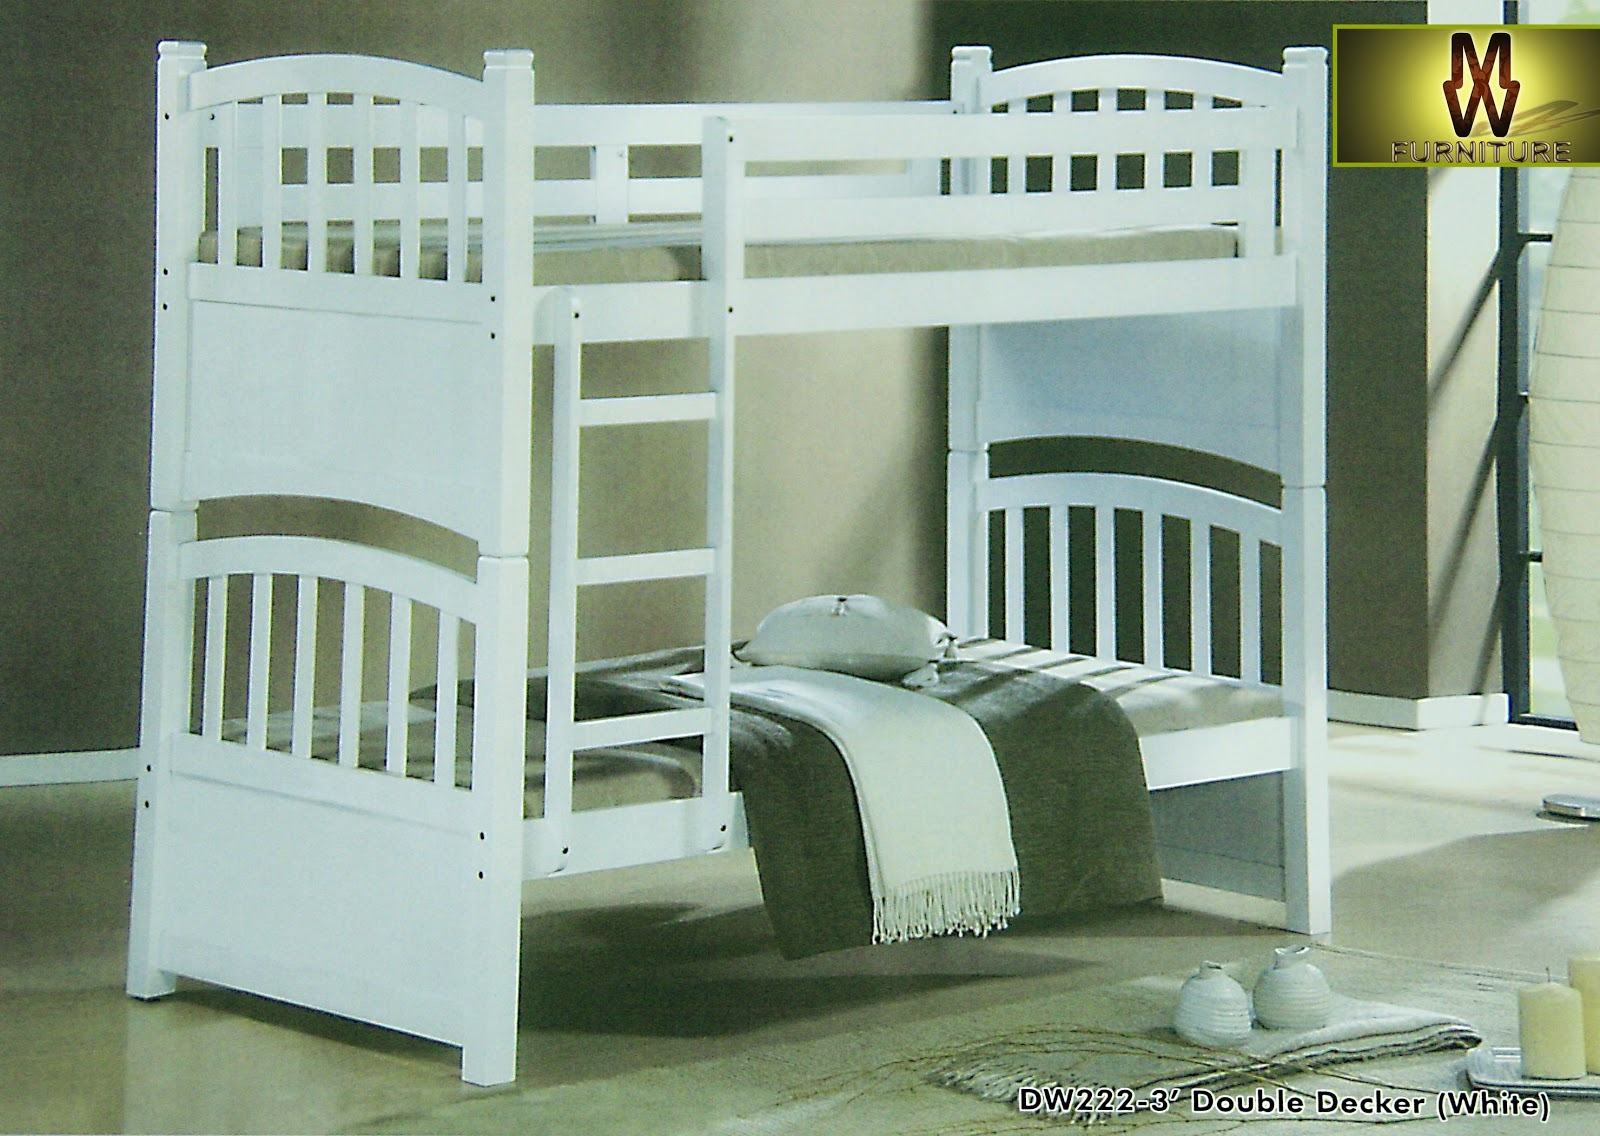 Modern Wood Furniture Buy Online Perabot. Where To Buy Wood For Furniture   Furniture Design Ideas